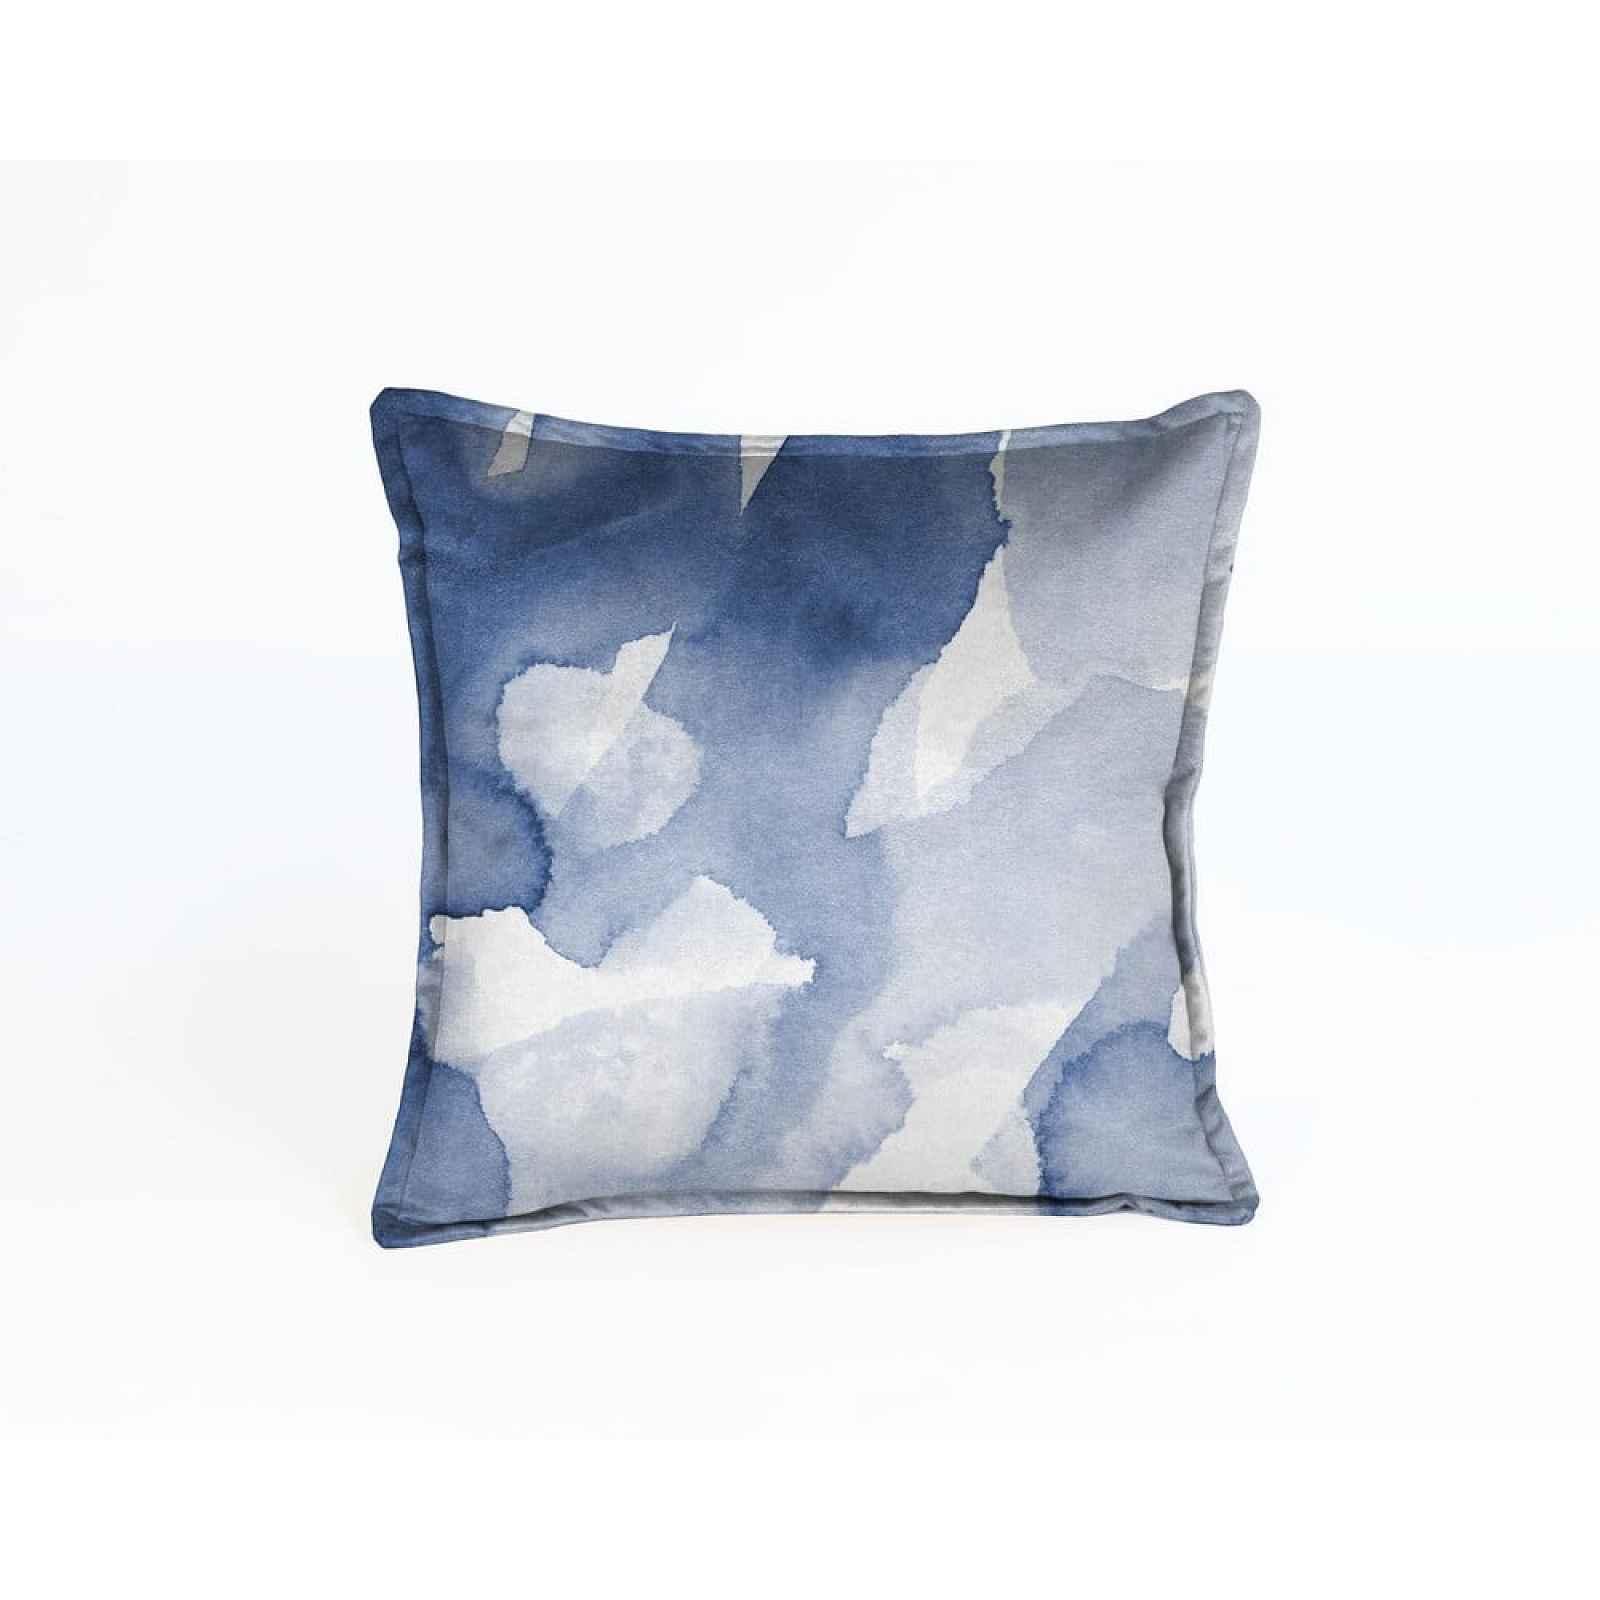 Modrý sametový polštář Velvet Atelier Abstract,45x45cm